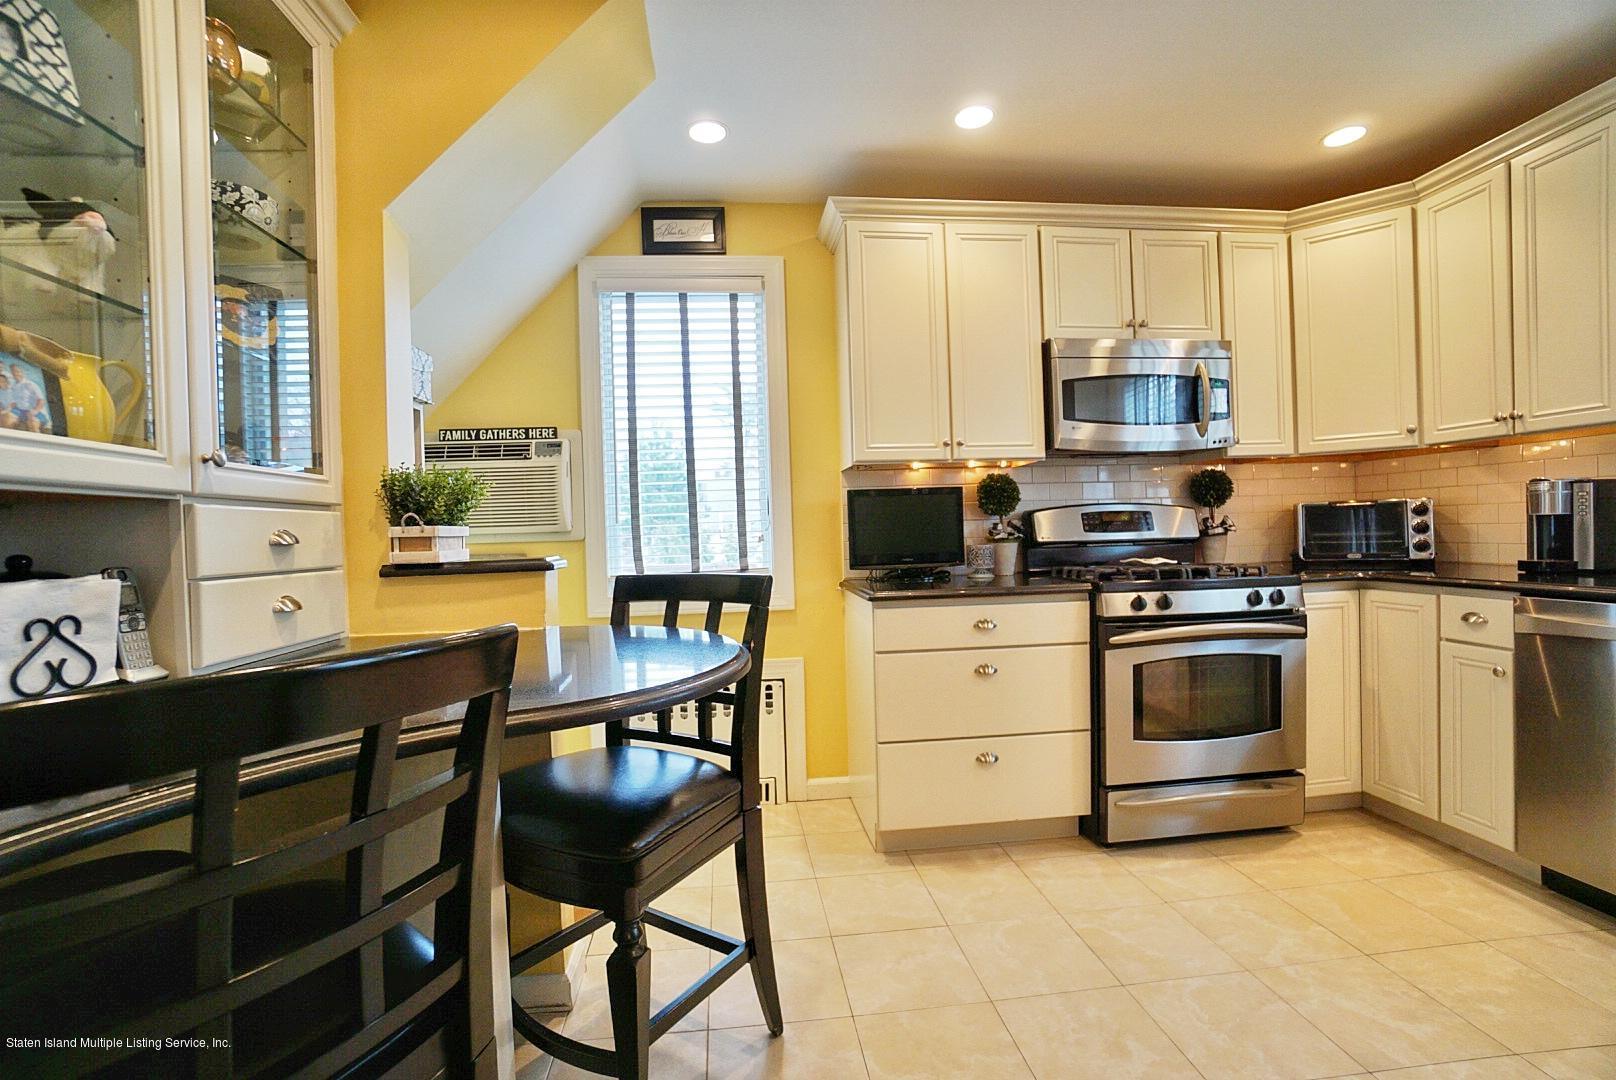 Single Family - Detached 171 Keiber Court  Staten Island, NY 10314, MLS-1127425-12